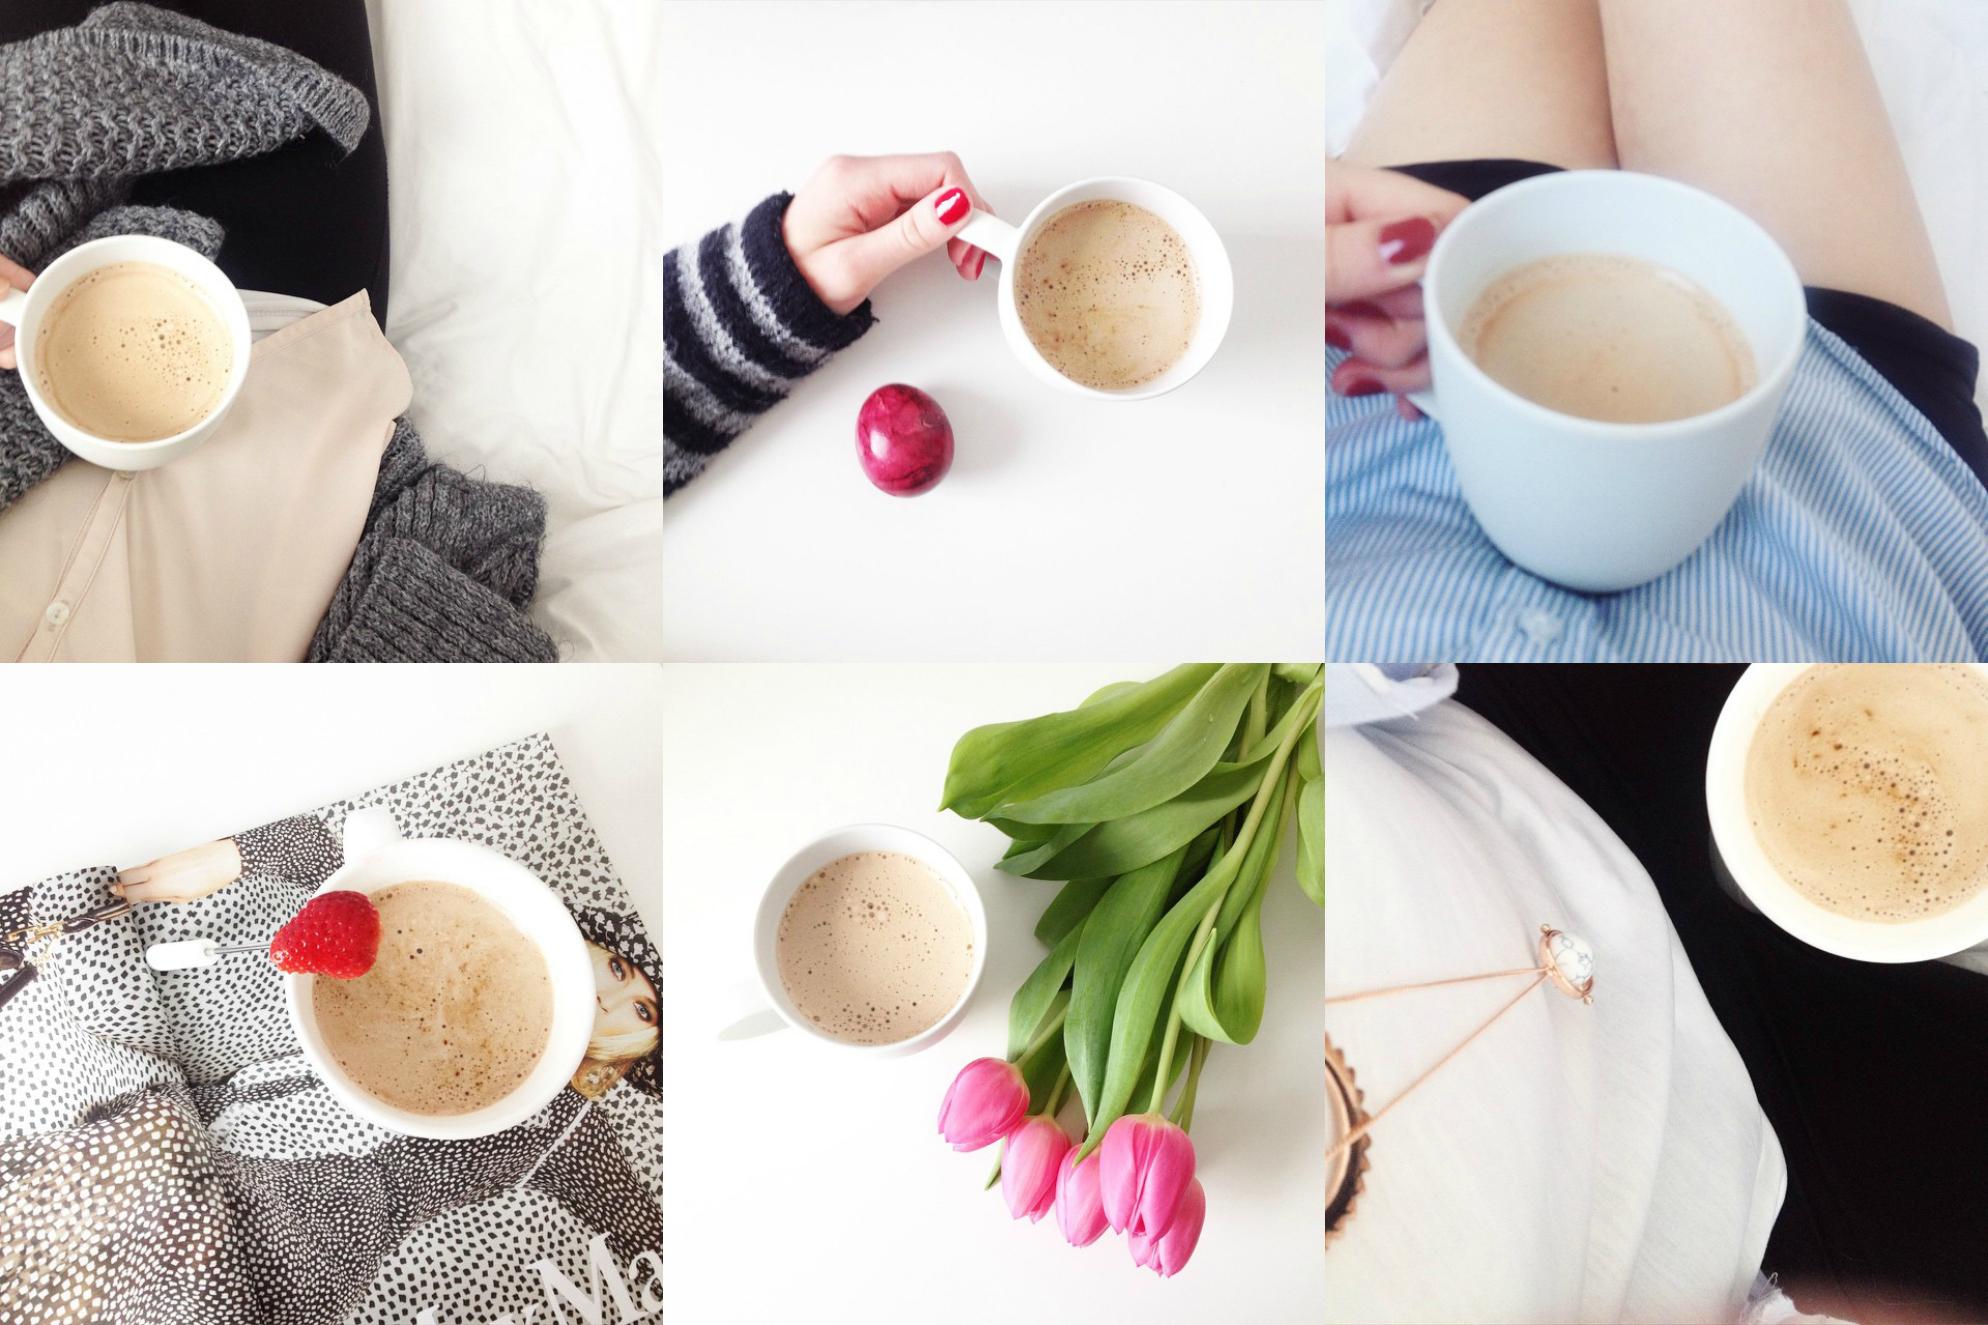 katiys.fashionblogger.instagram.cappuccino